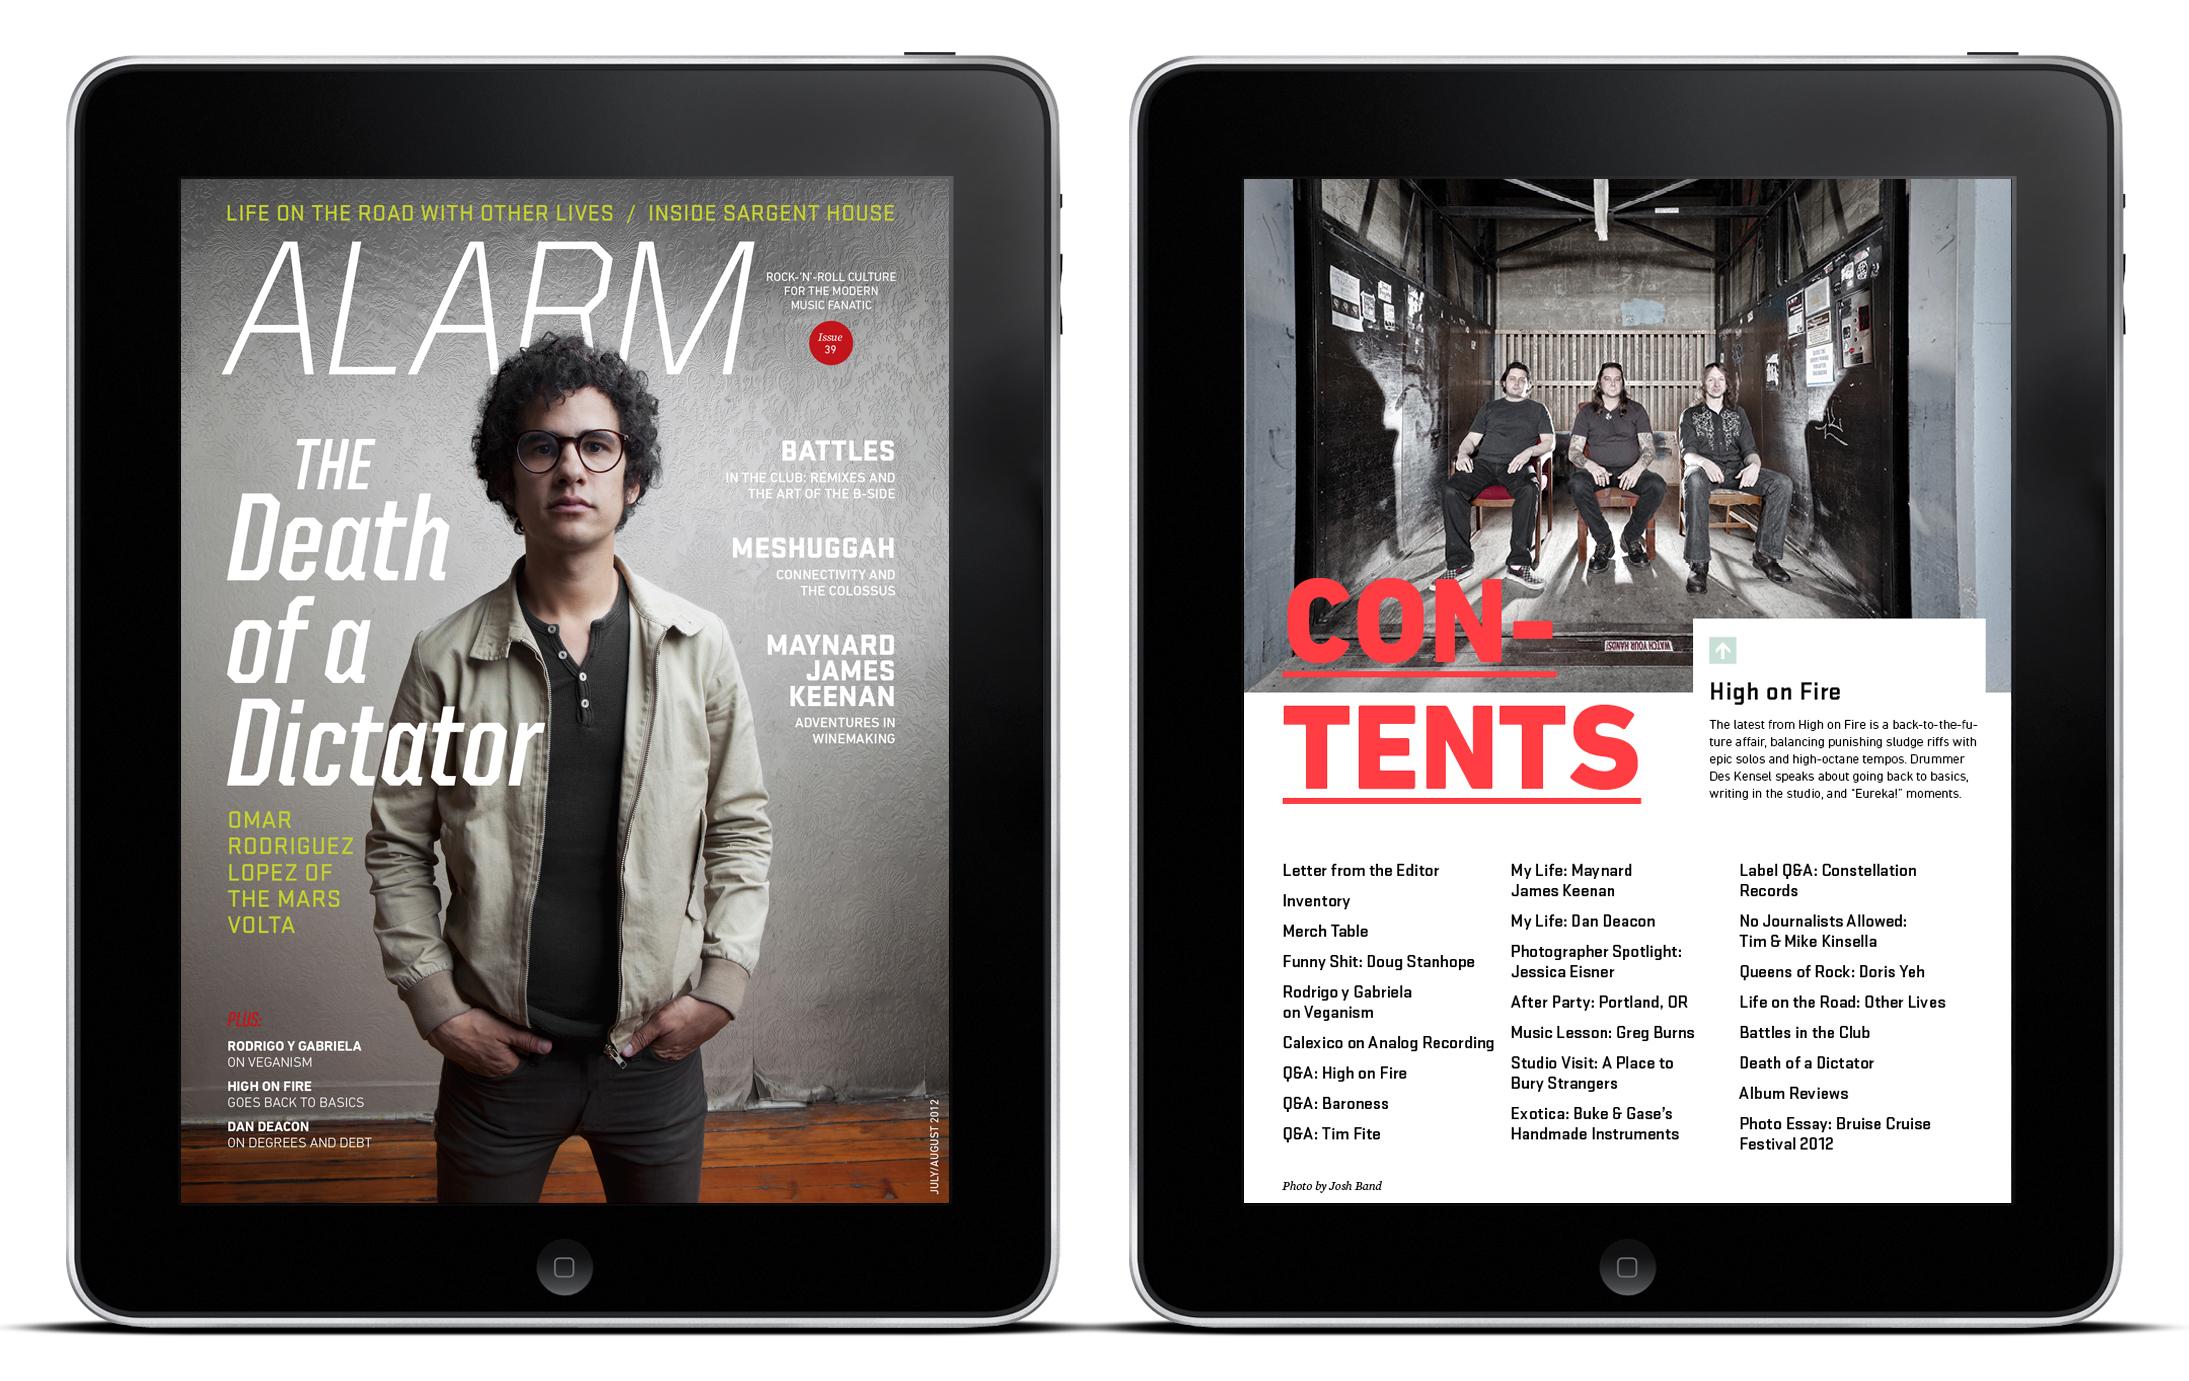 ALARM Magazine iPad Edition